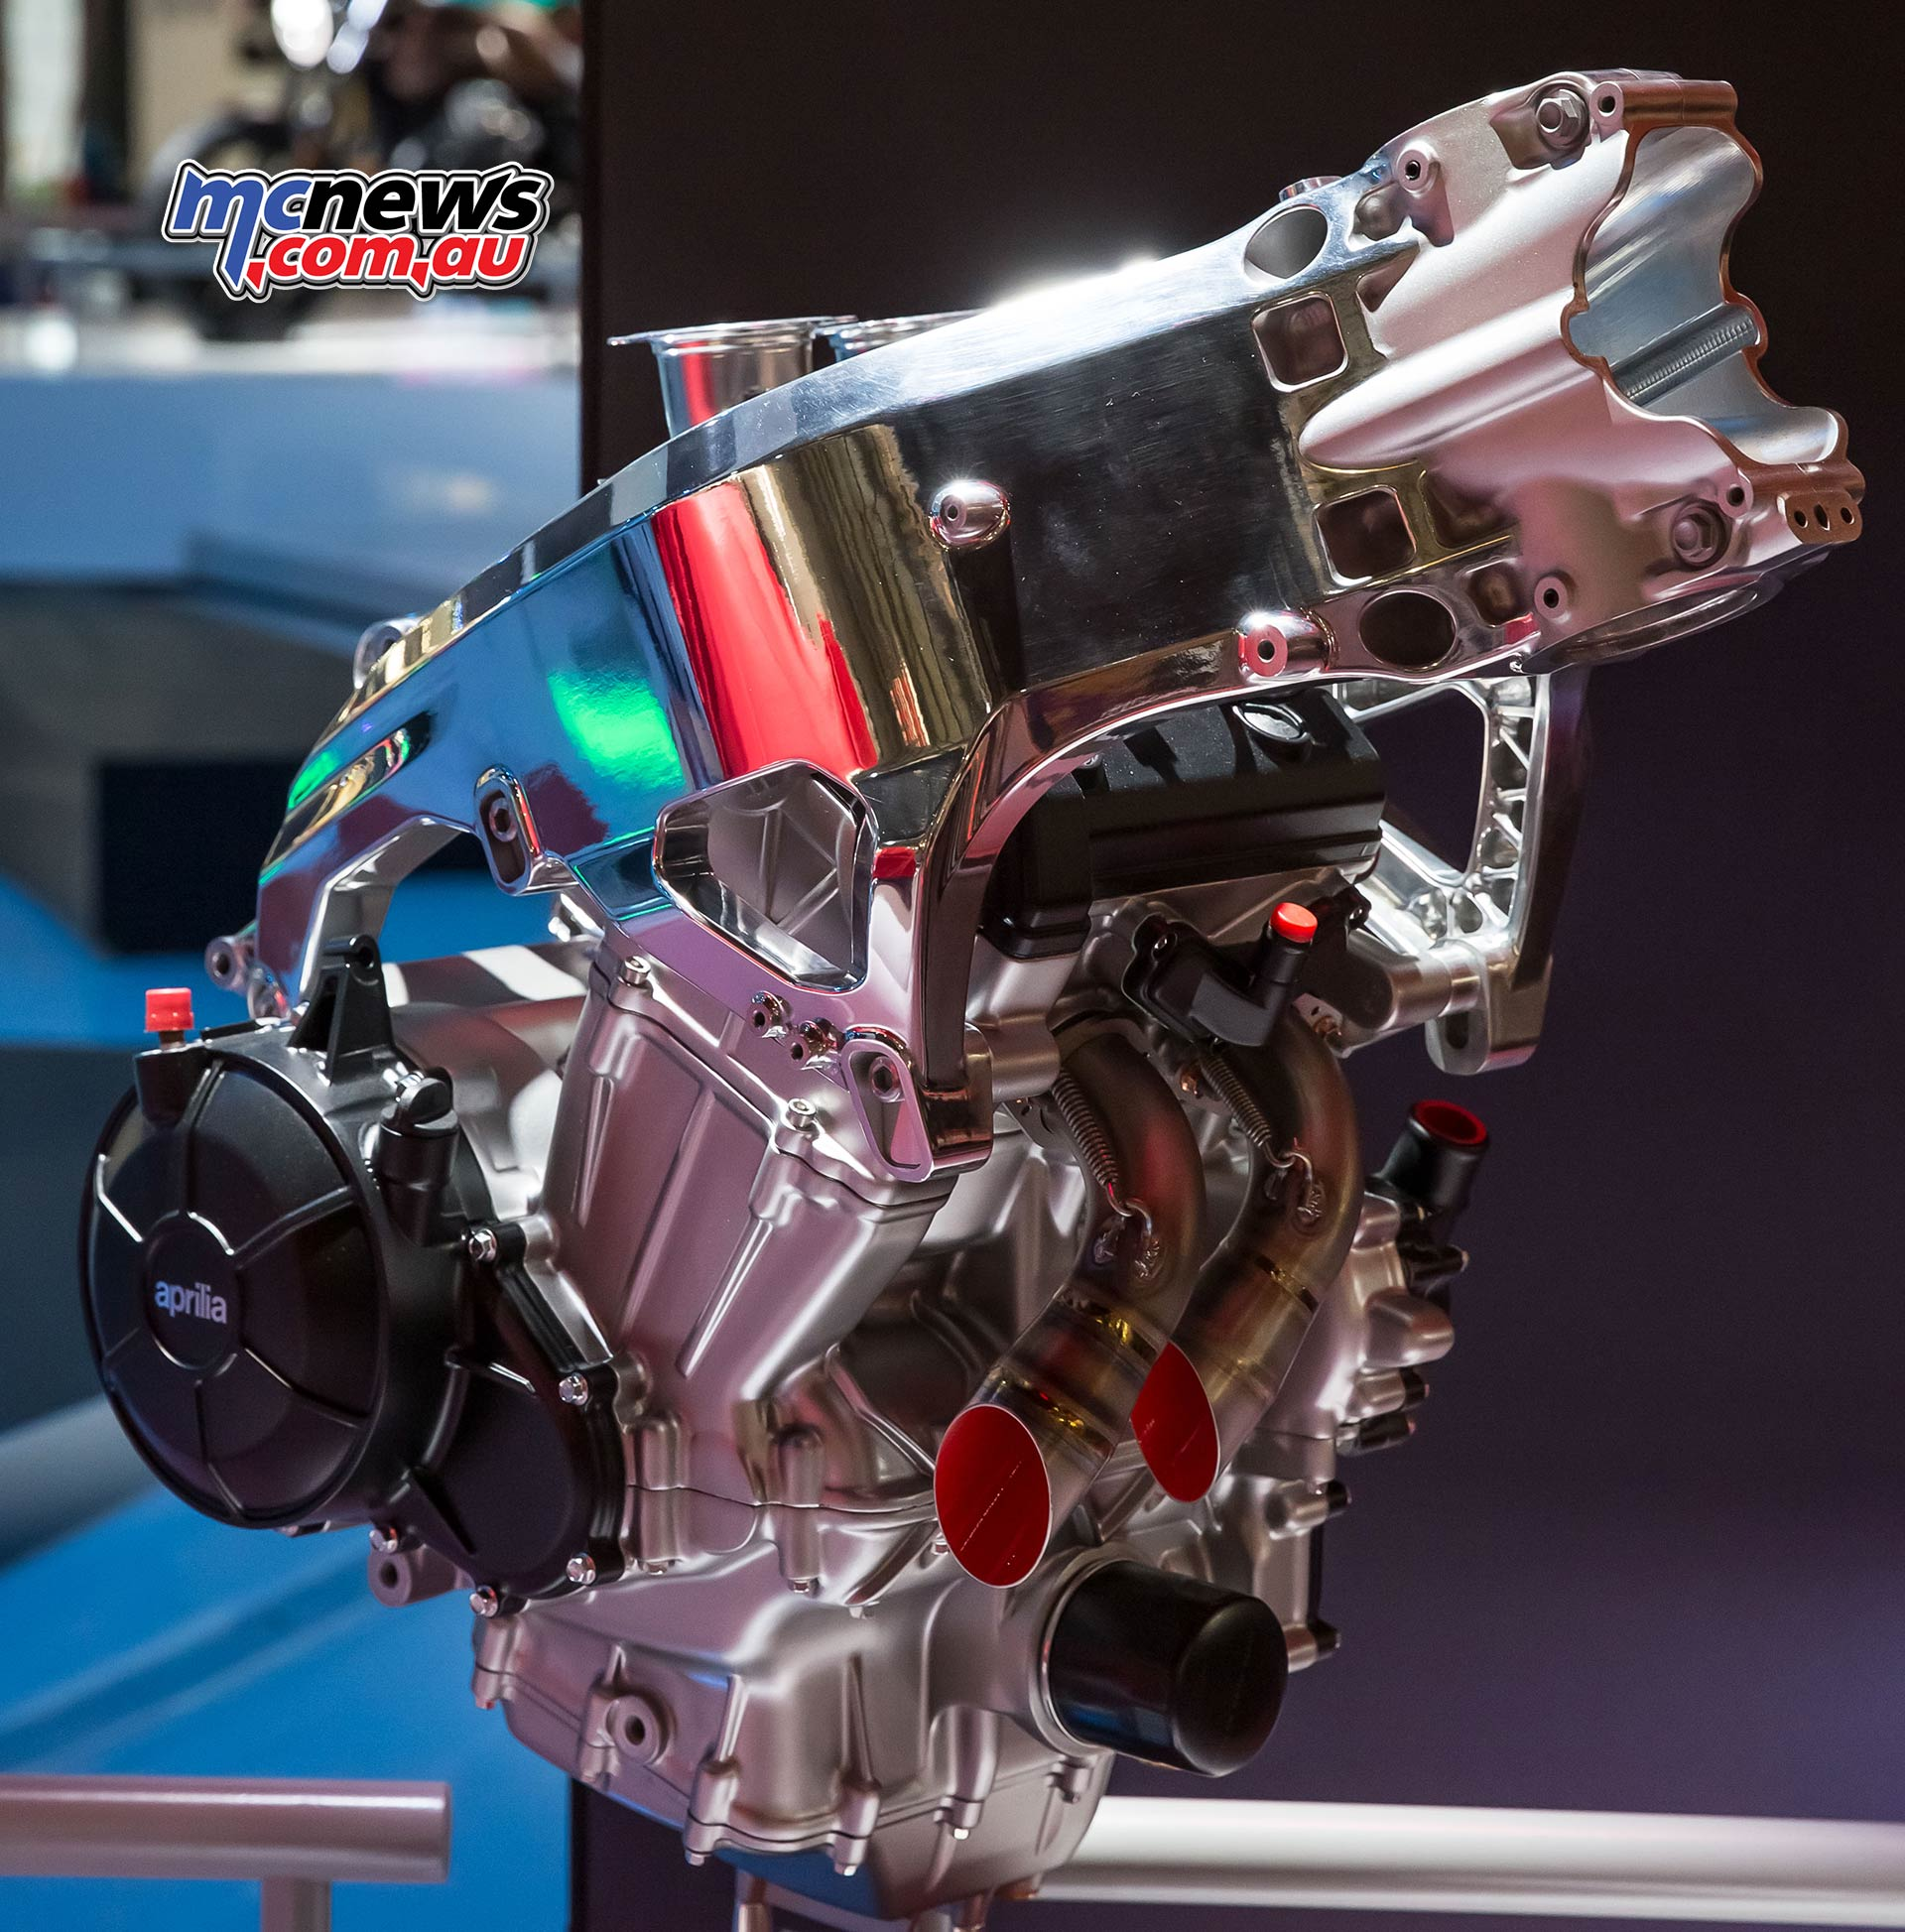 2019-Aprilia-RS660-Concept-7